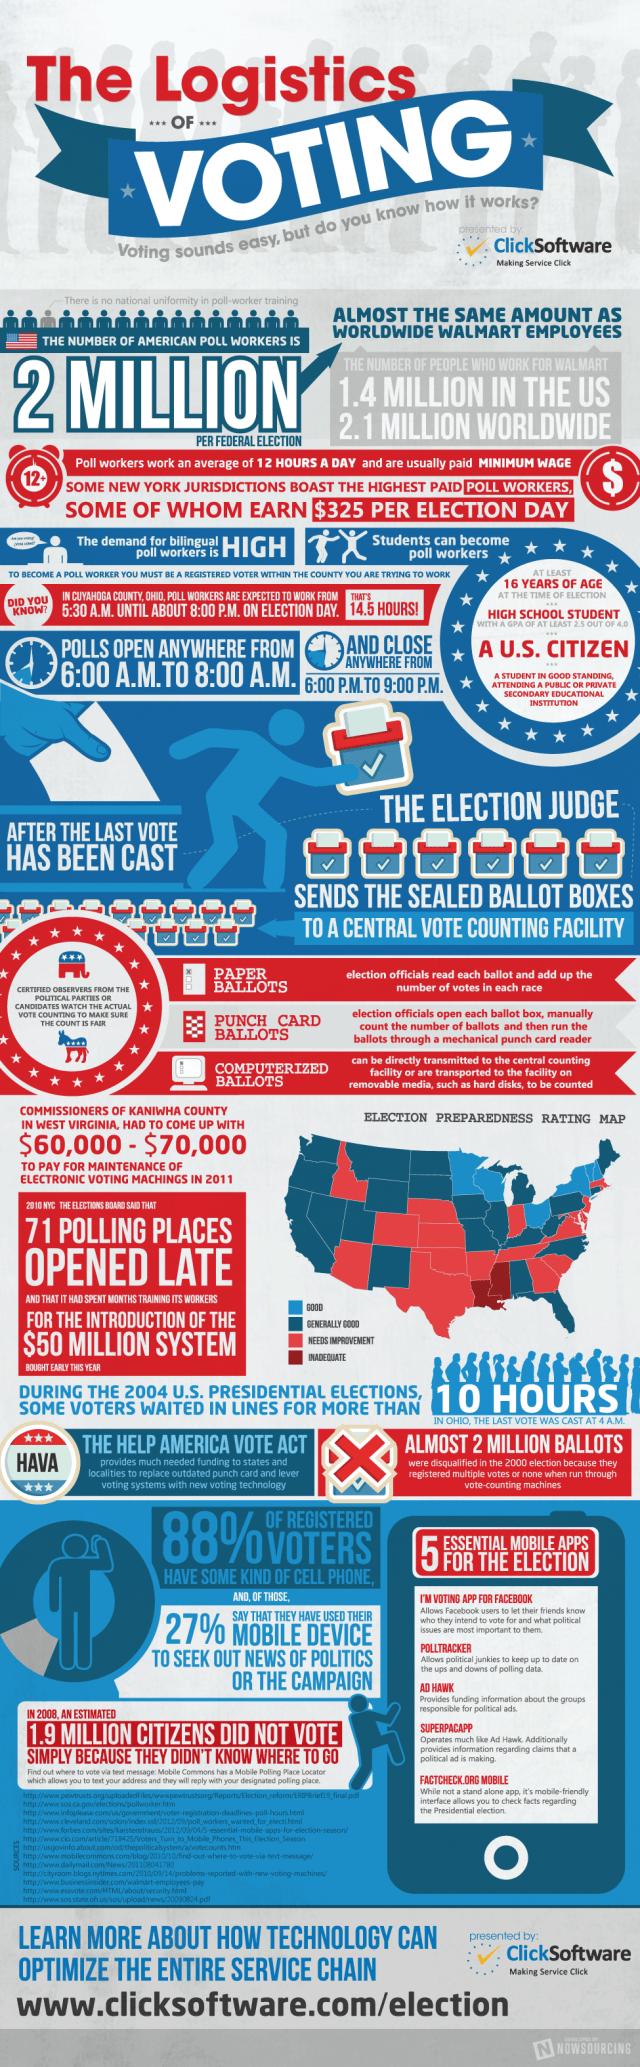 Logistics of Voting